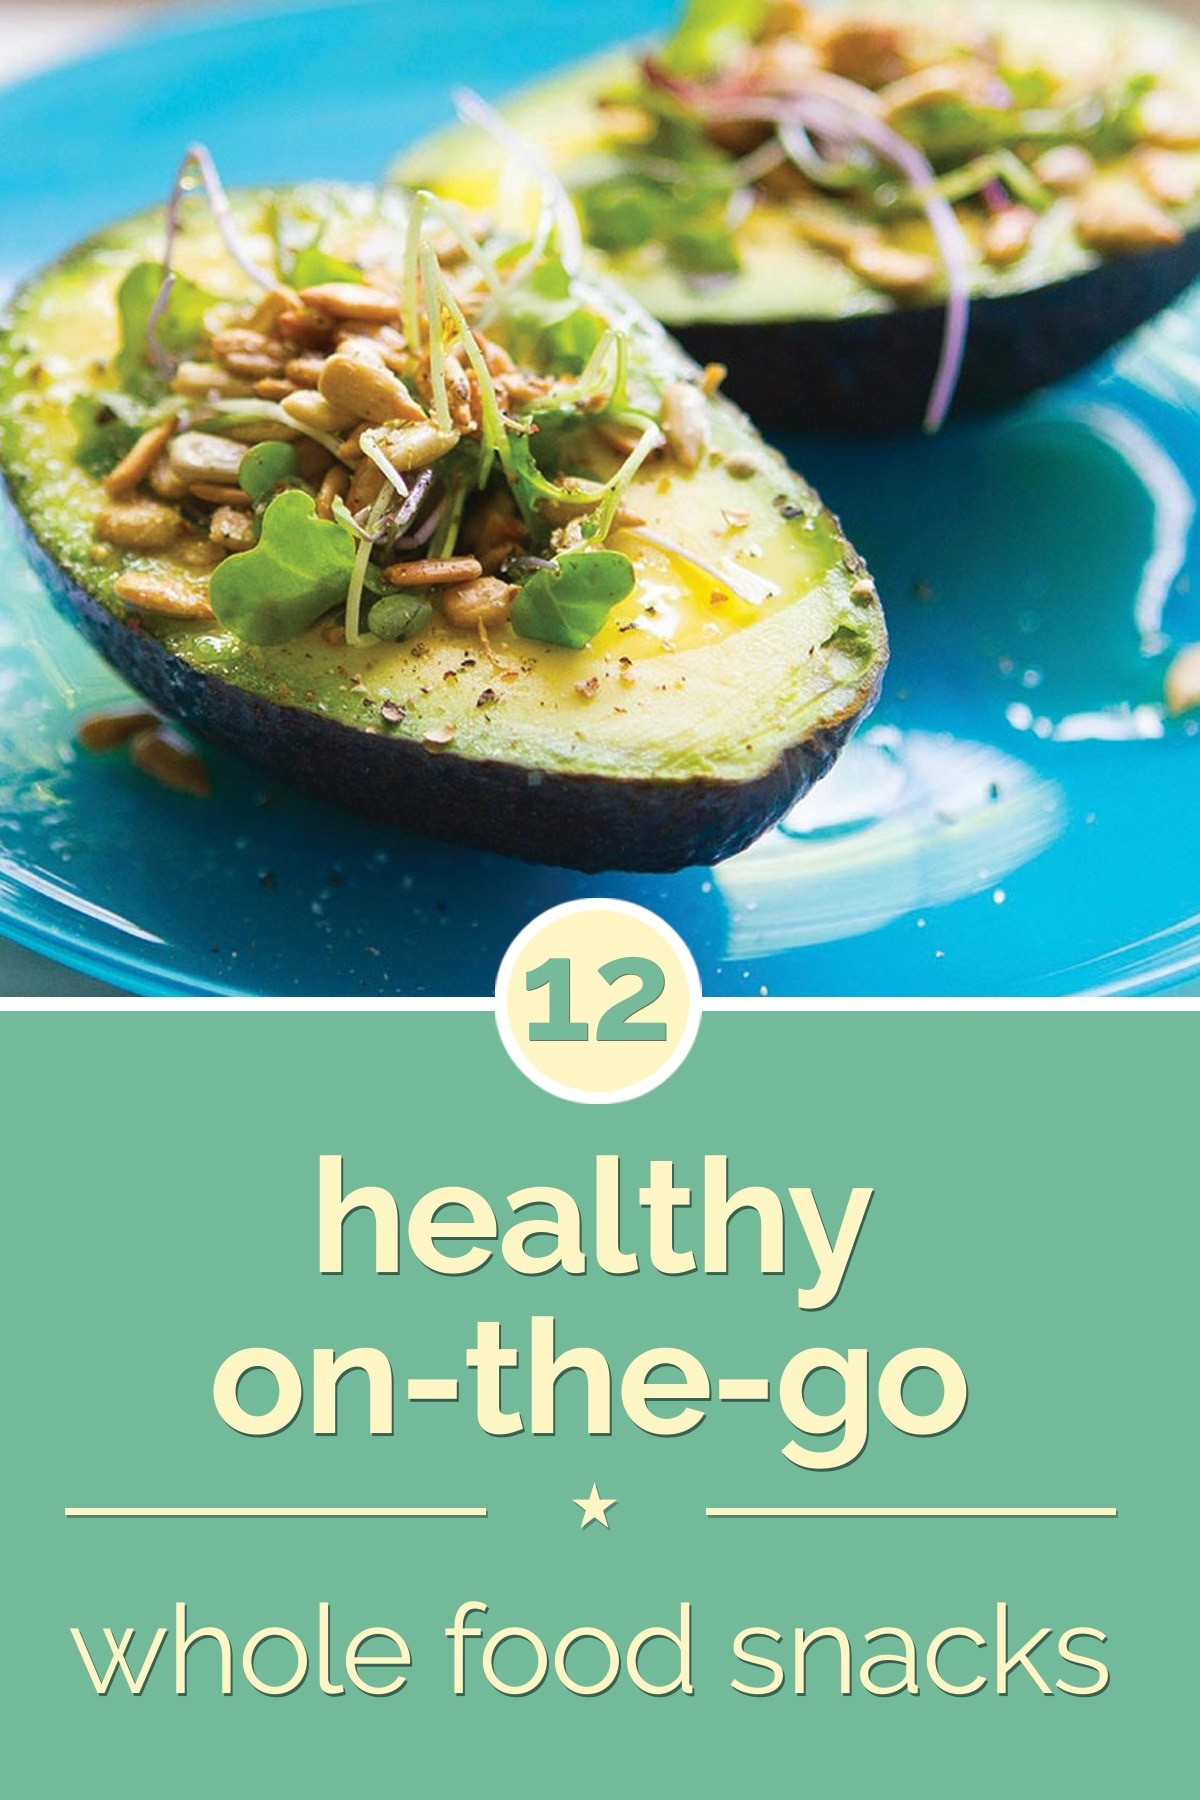 On The Go Healthy Snacks  12 Healthy the Go Whole Food Snacks thegoodstuff